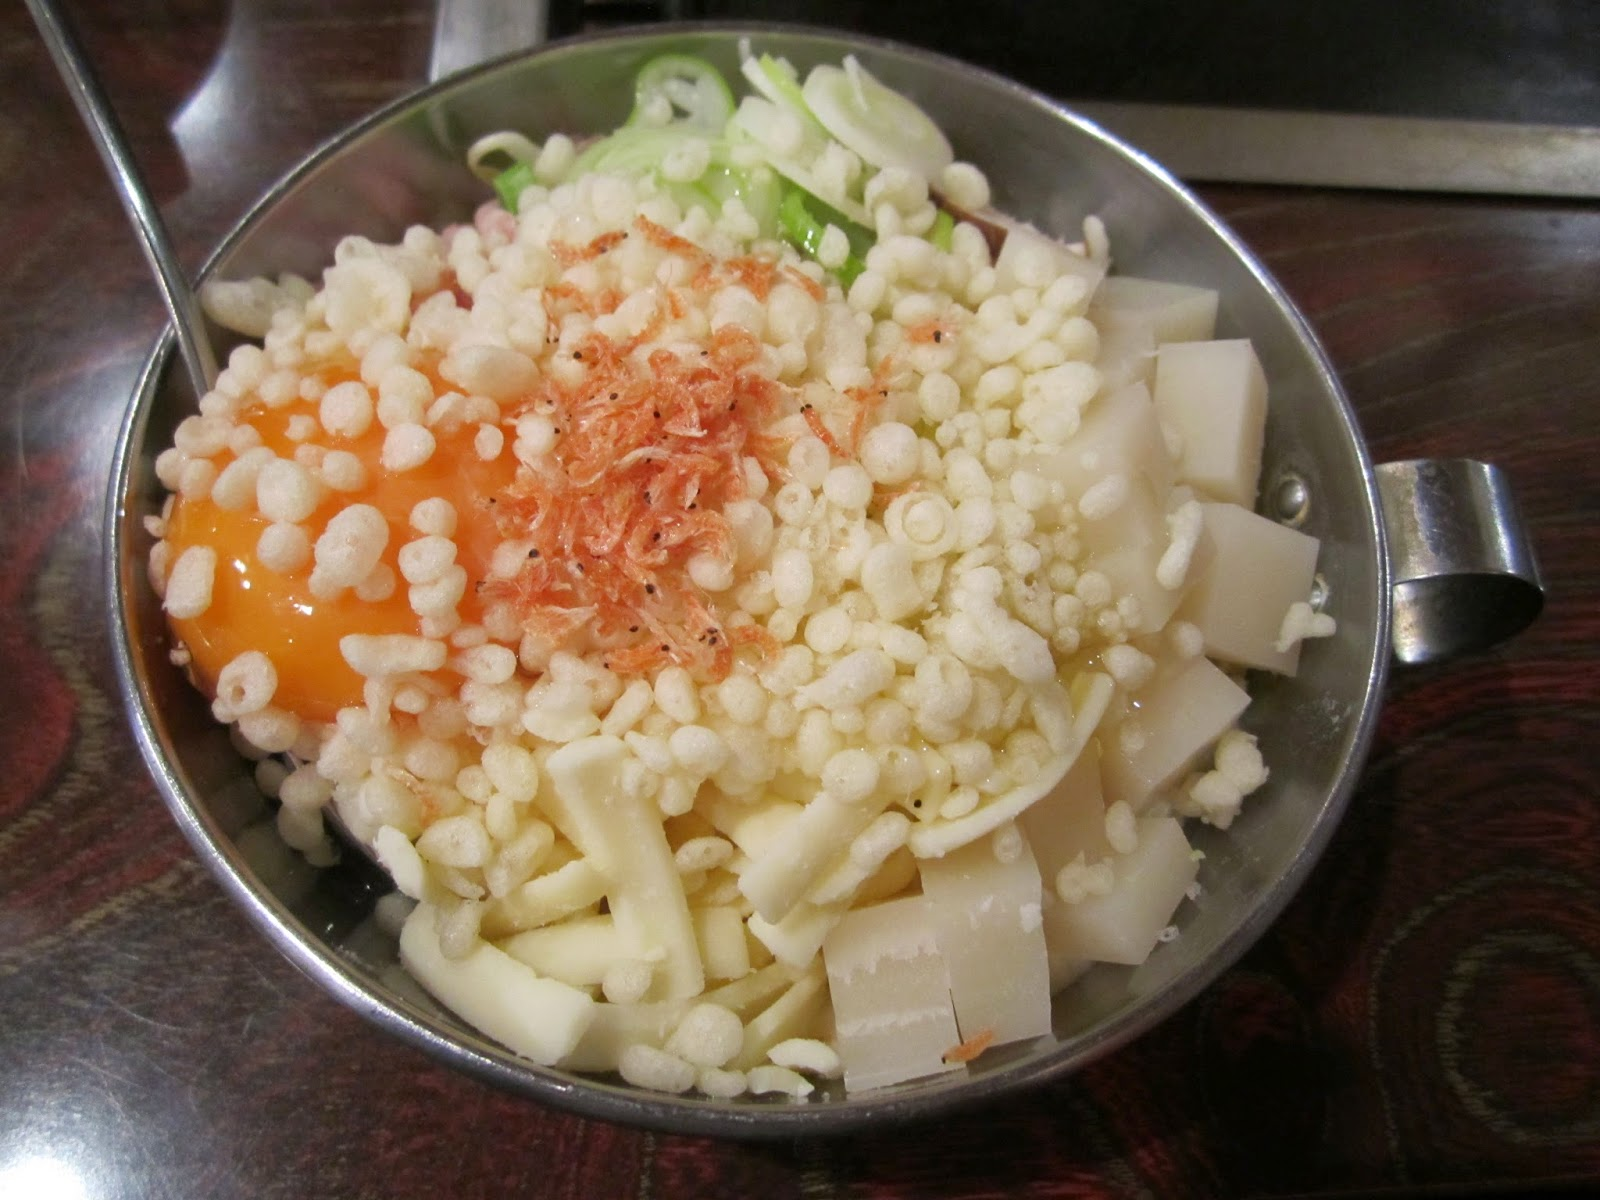 Mochi Cheese Ten Okonomiyaki Asakusa Towada もちチーズ天 お好み焼き 浅草 十和田市